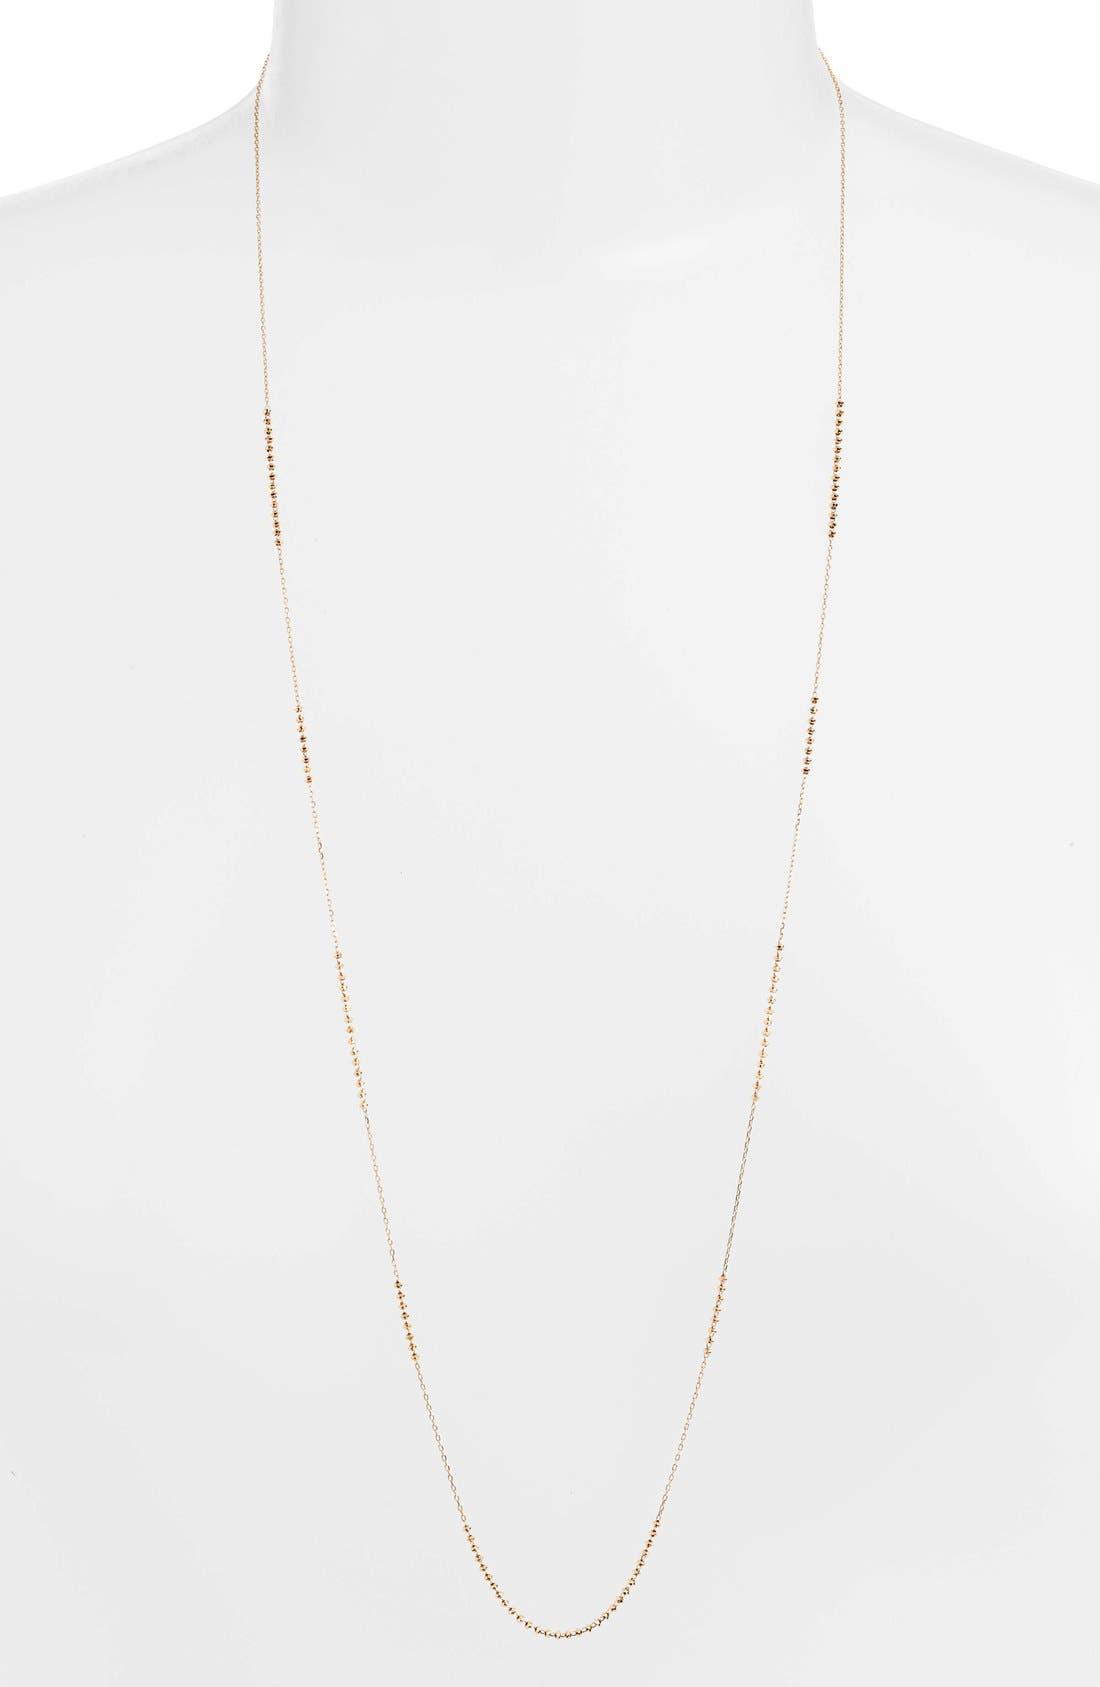 Main Image - Poppy Finch 'Shimmer' Strand Necklace